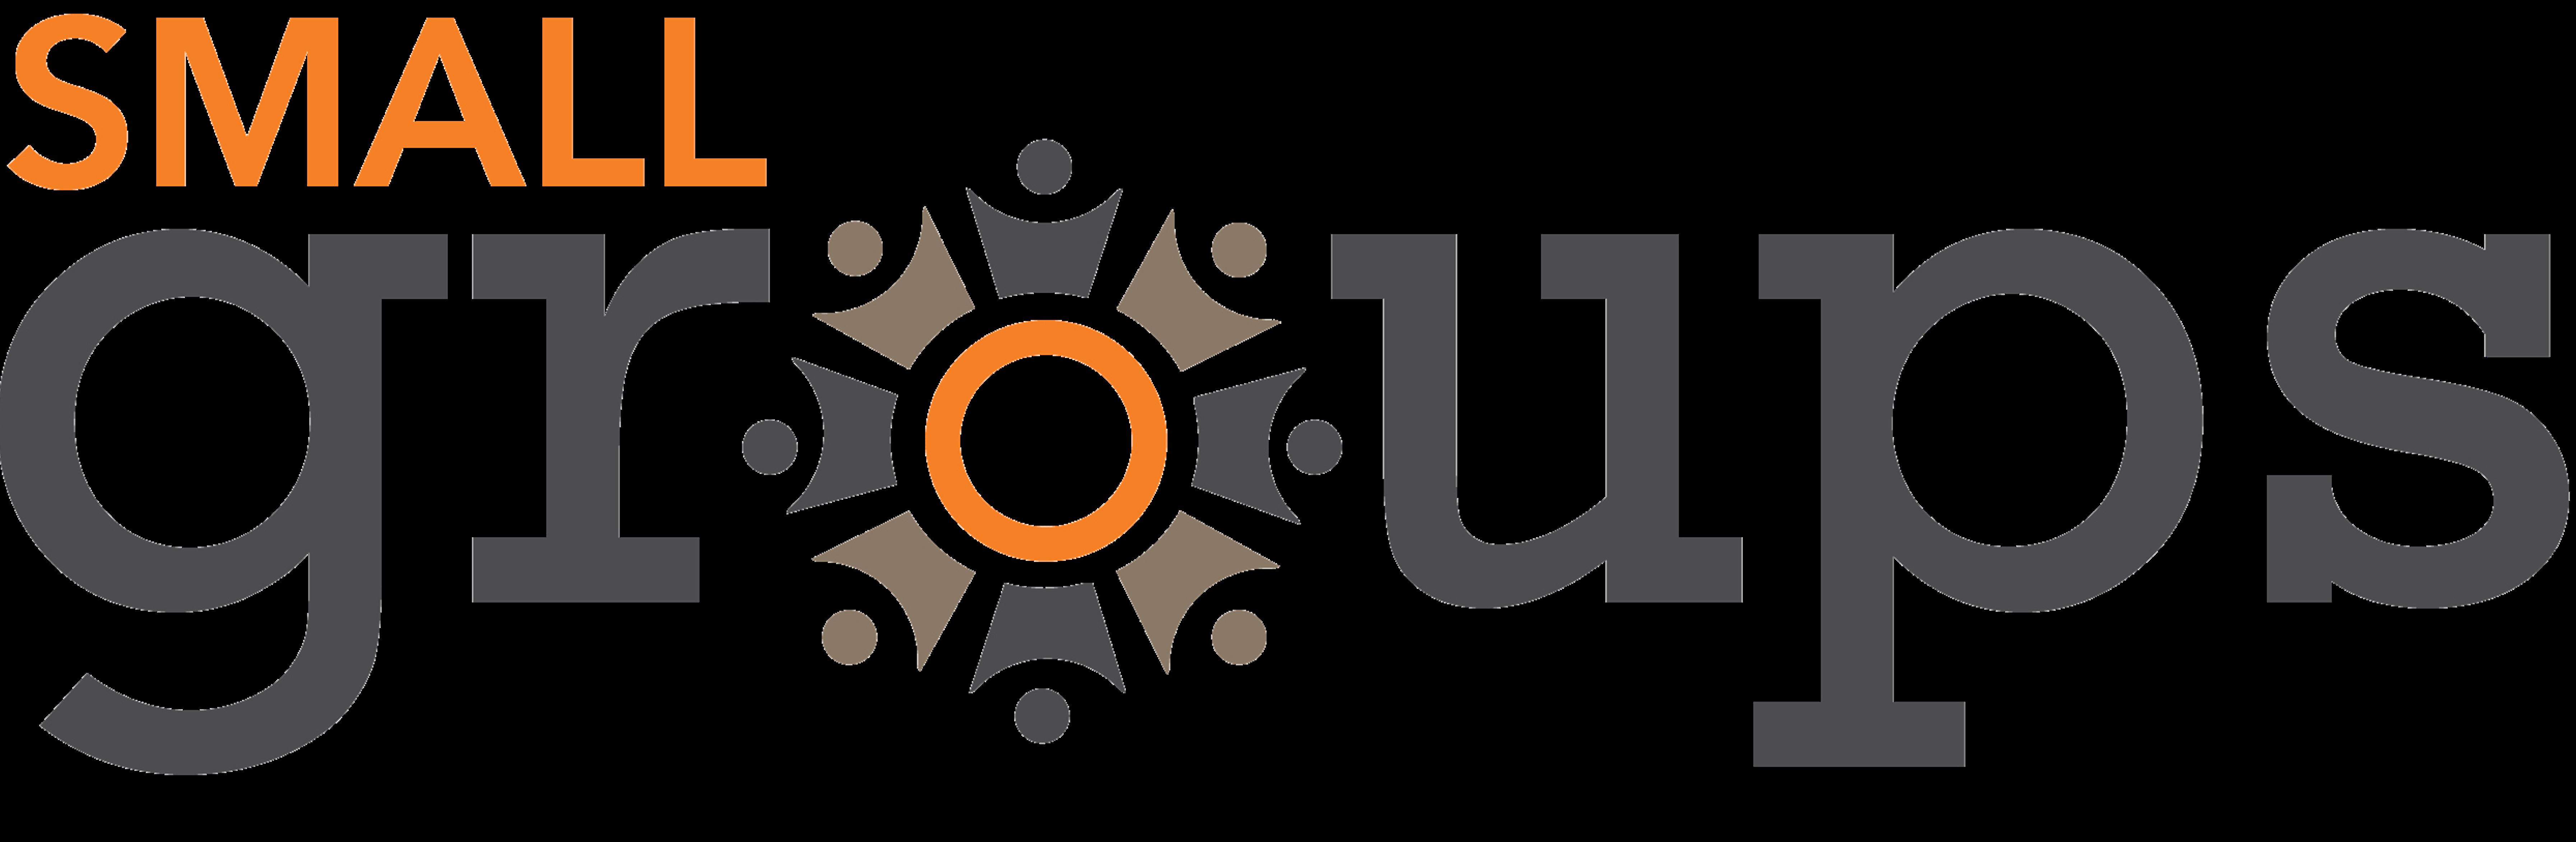 Small group logo trans motto 1